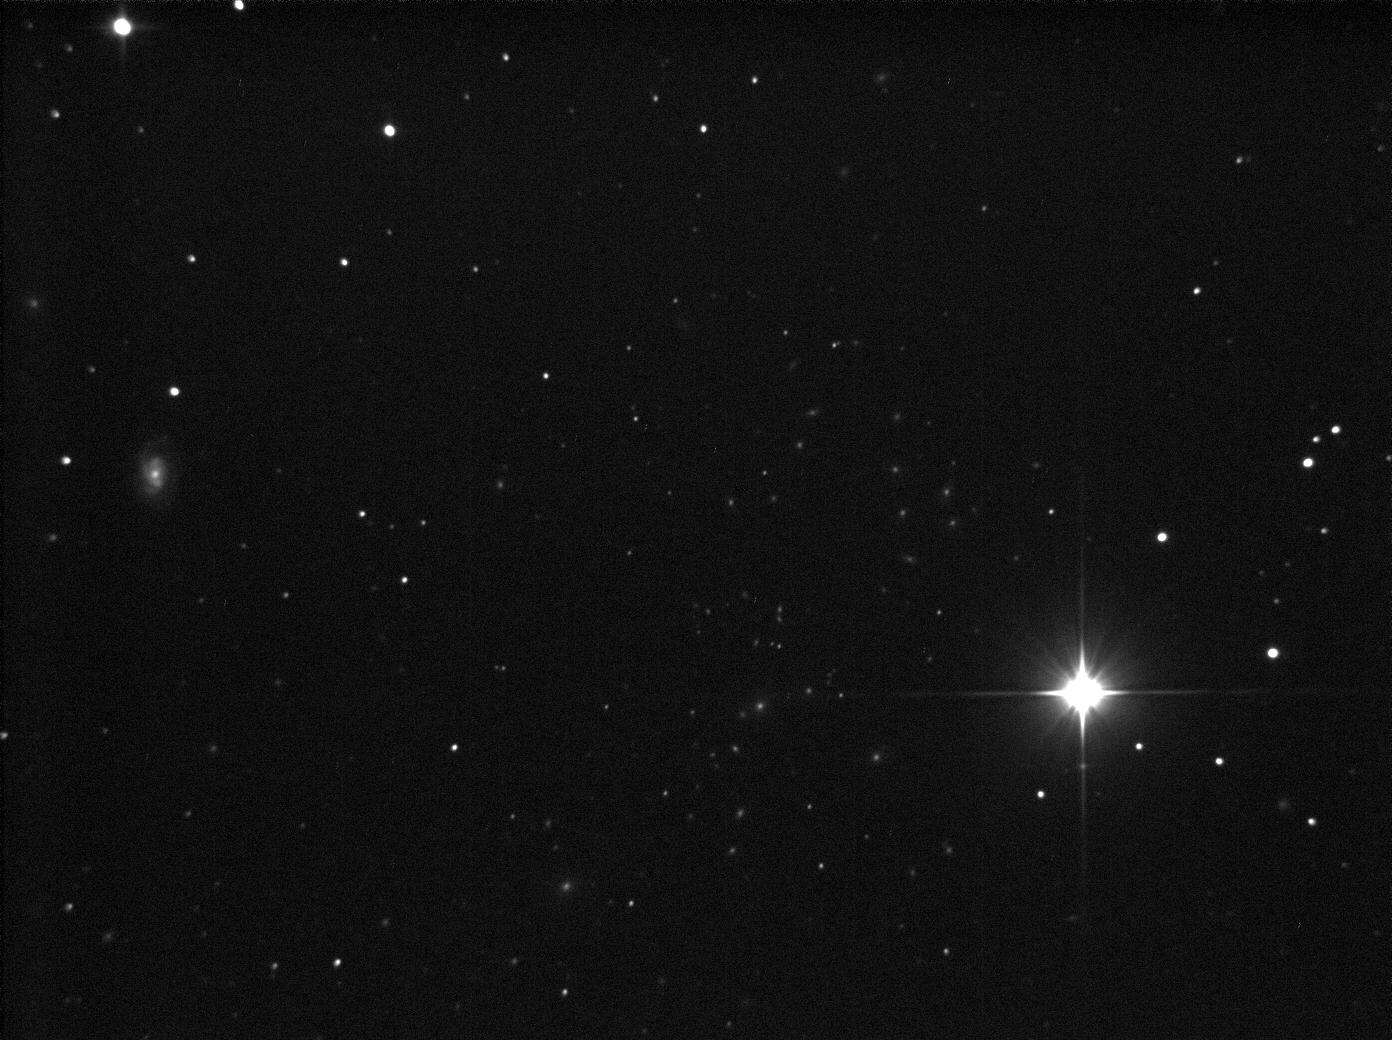 ABELL1377 16x15s   B1   CLSCCD